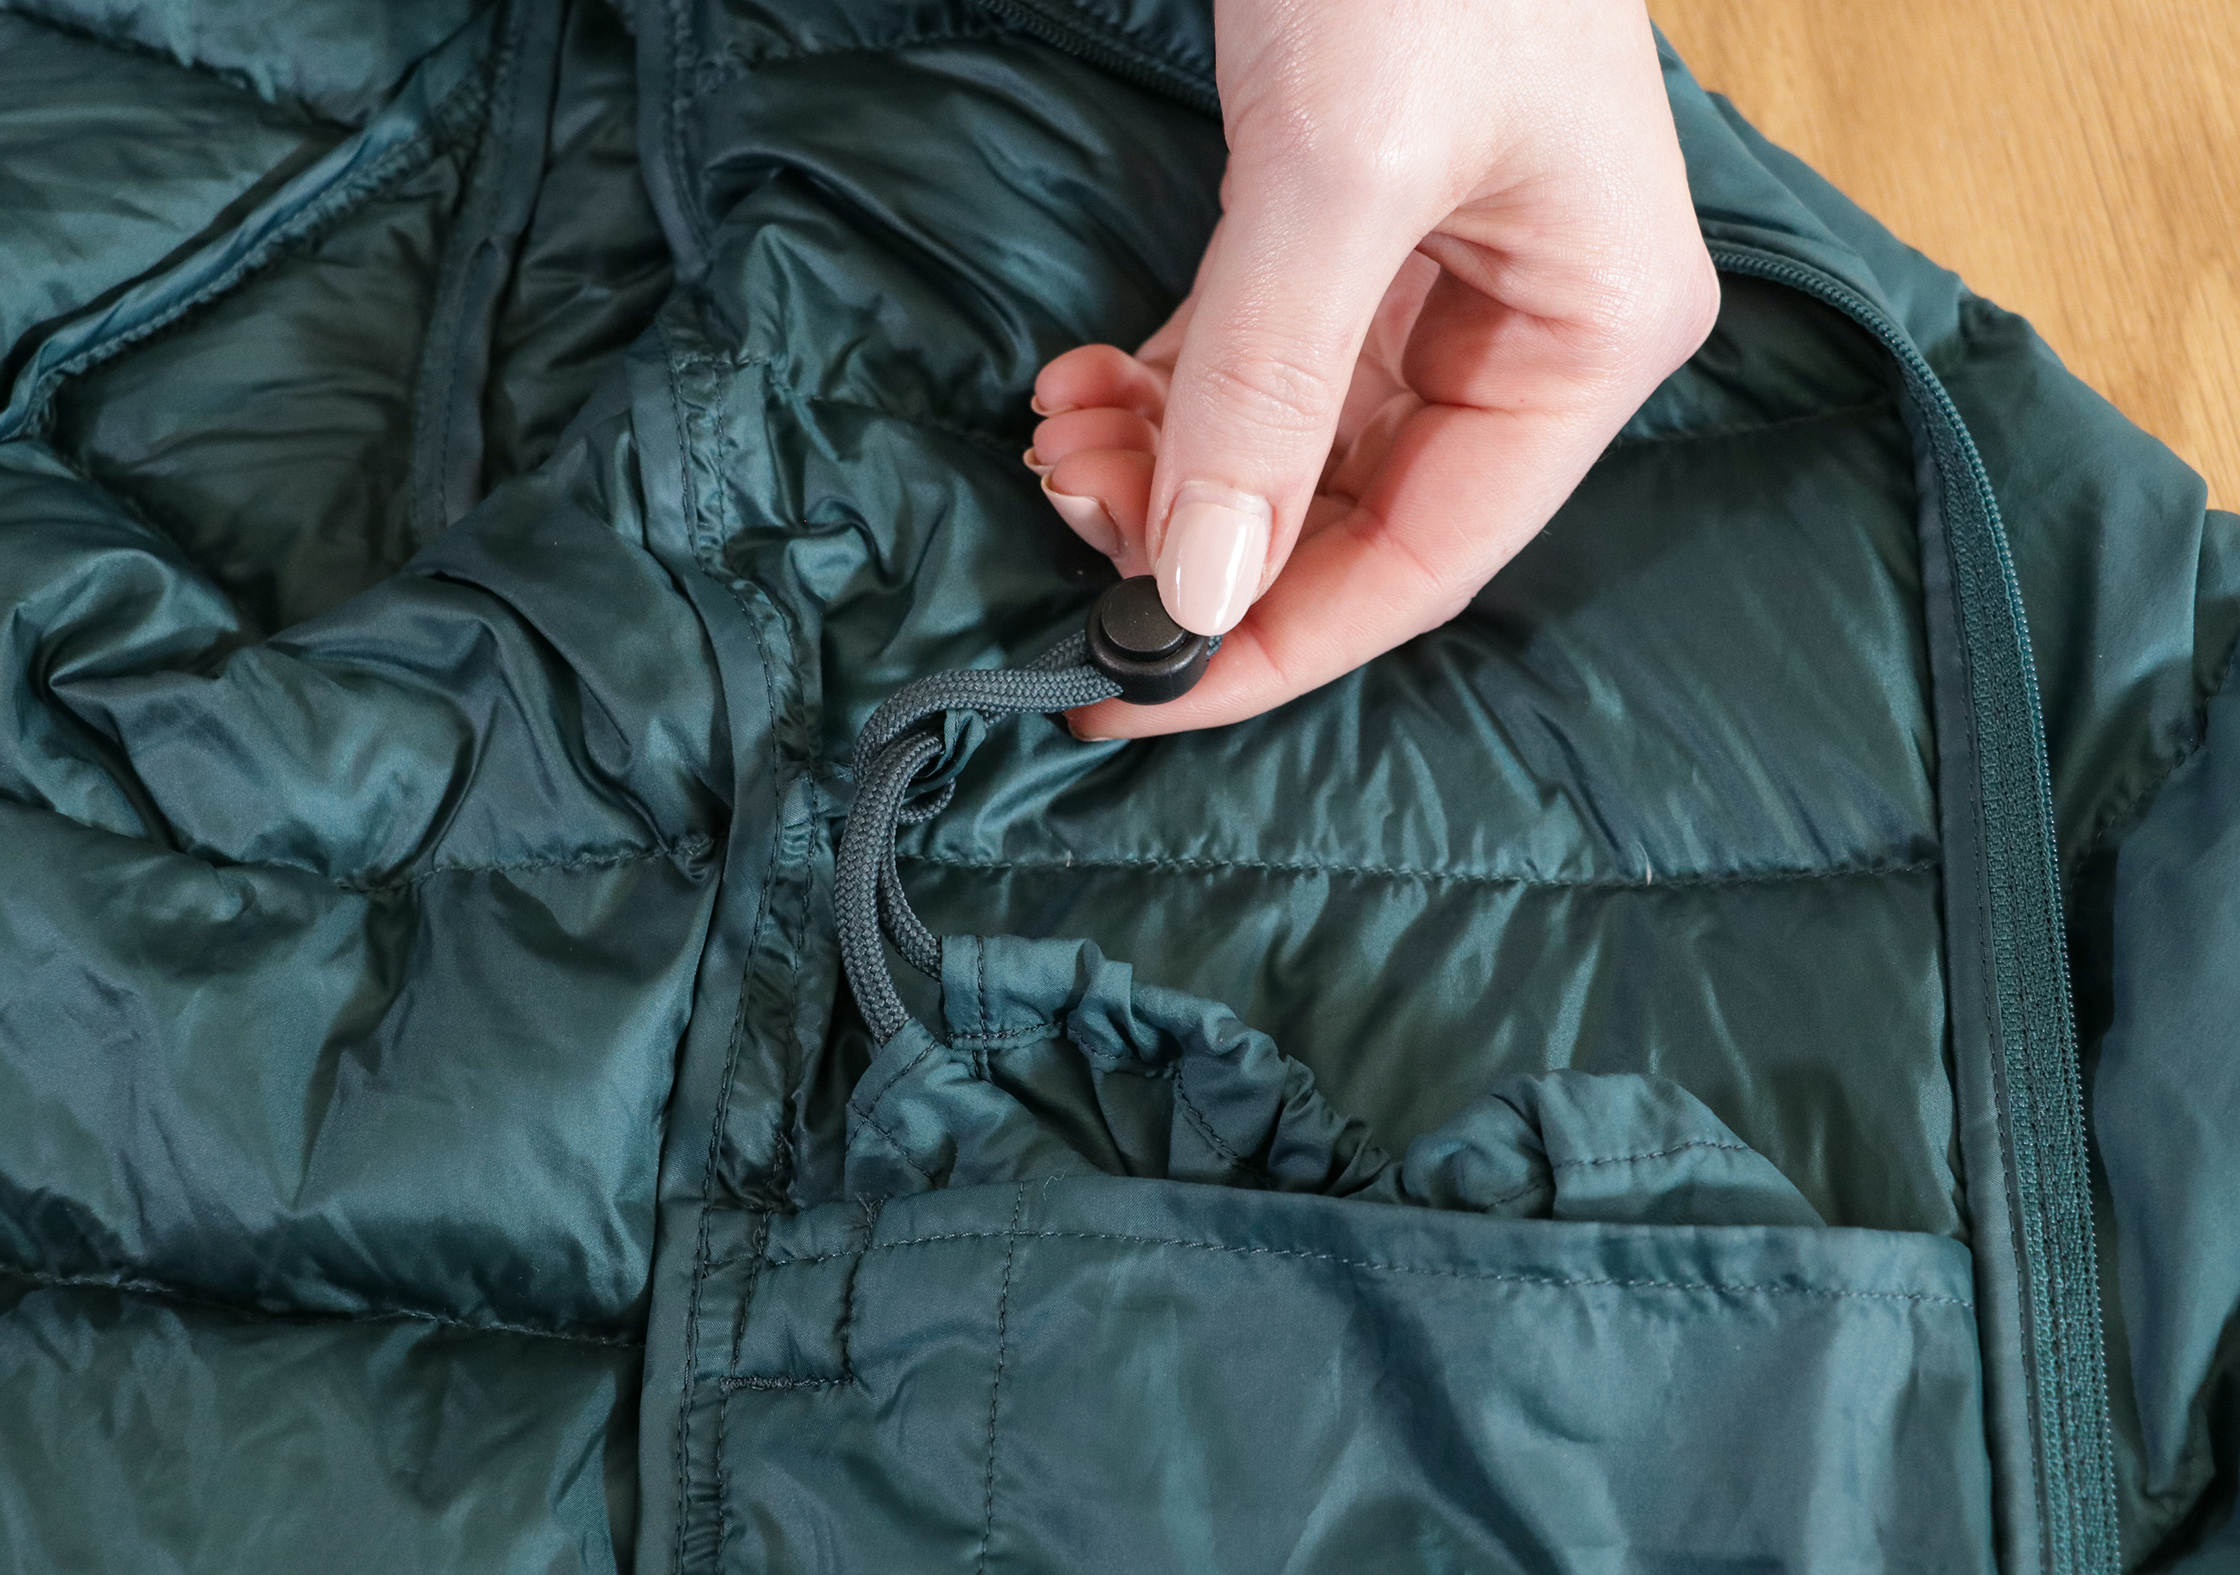 Uniqlo Ultra Light Down Jacket Internal Pouch Attachment